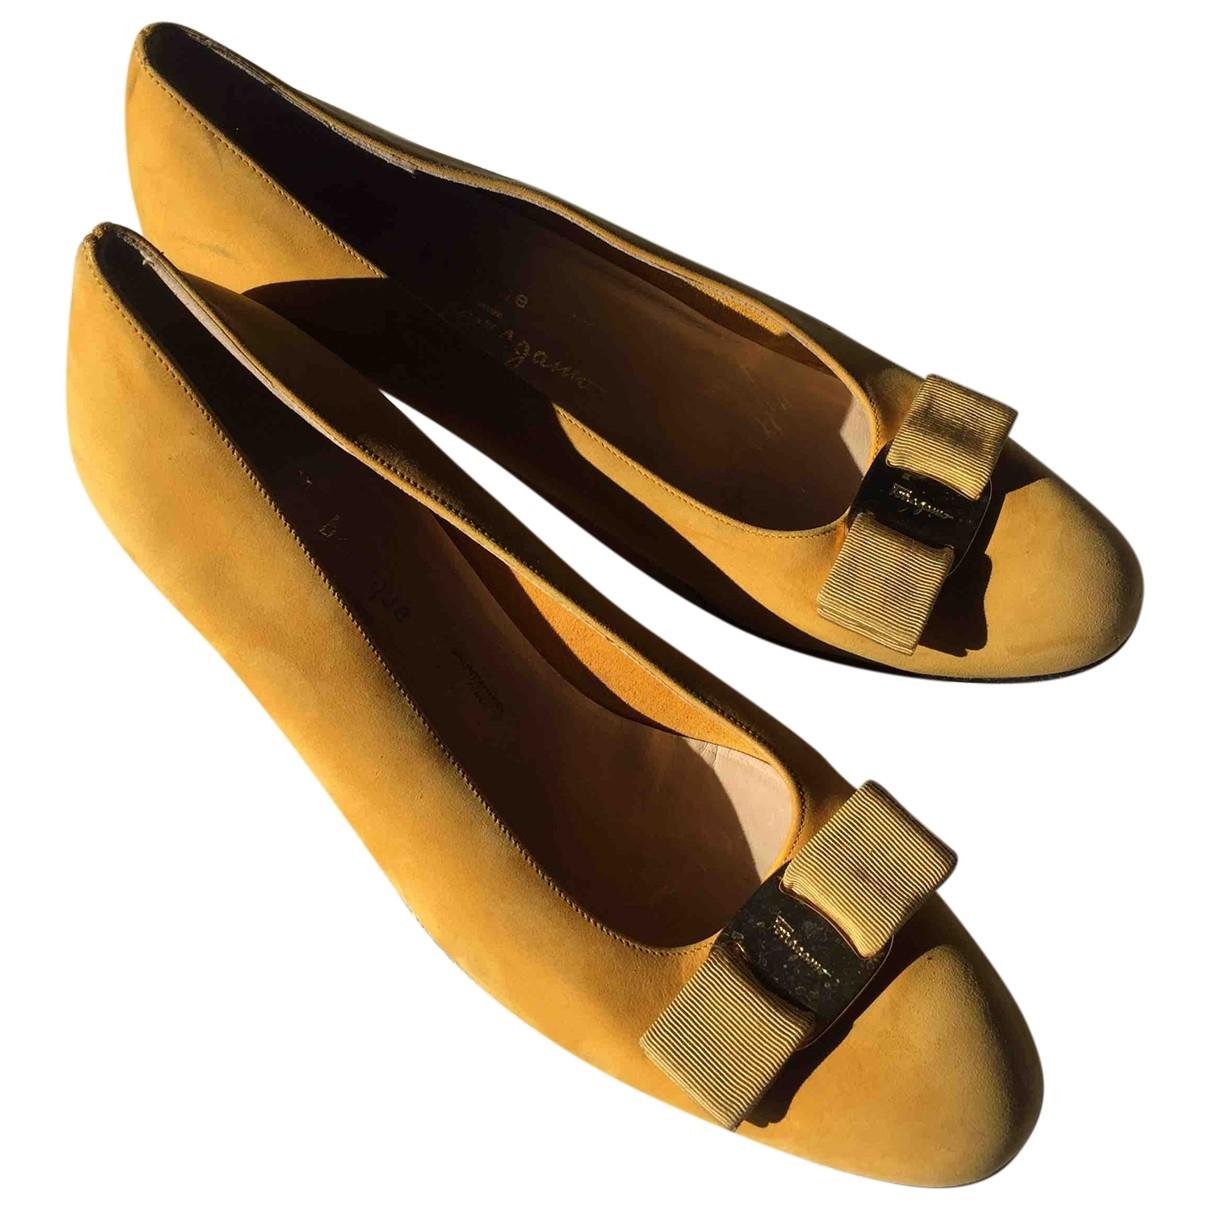 Salvatore Ferragamo \N Yellow Suede Flats for Women 7.5 US